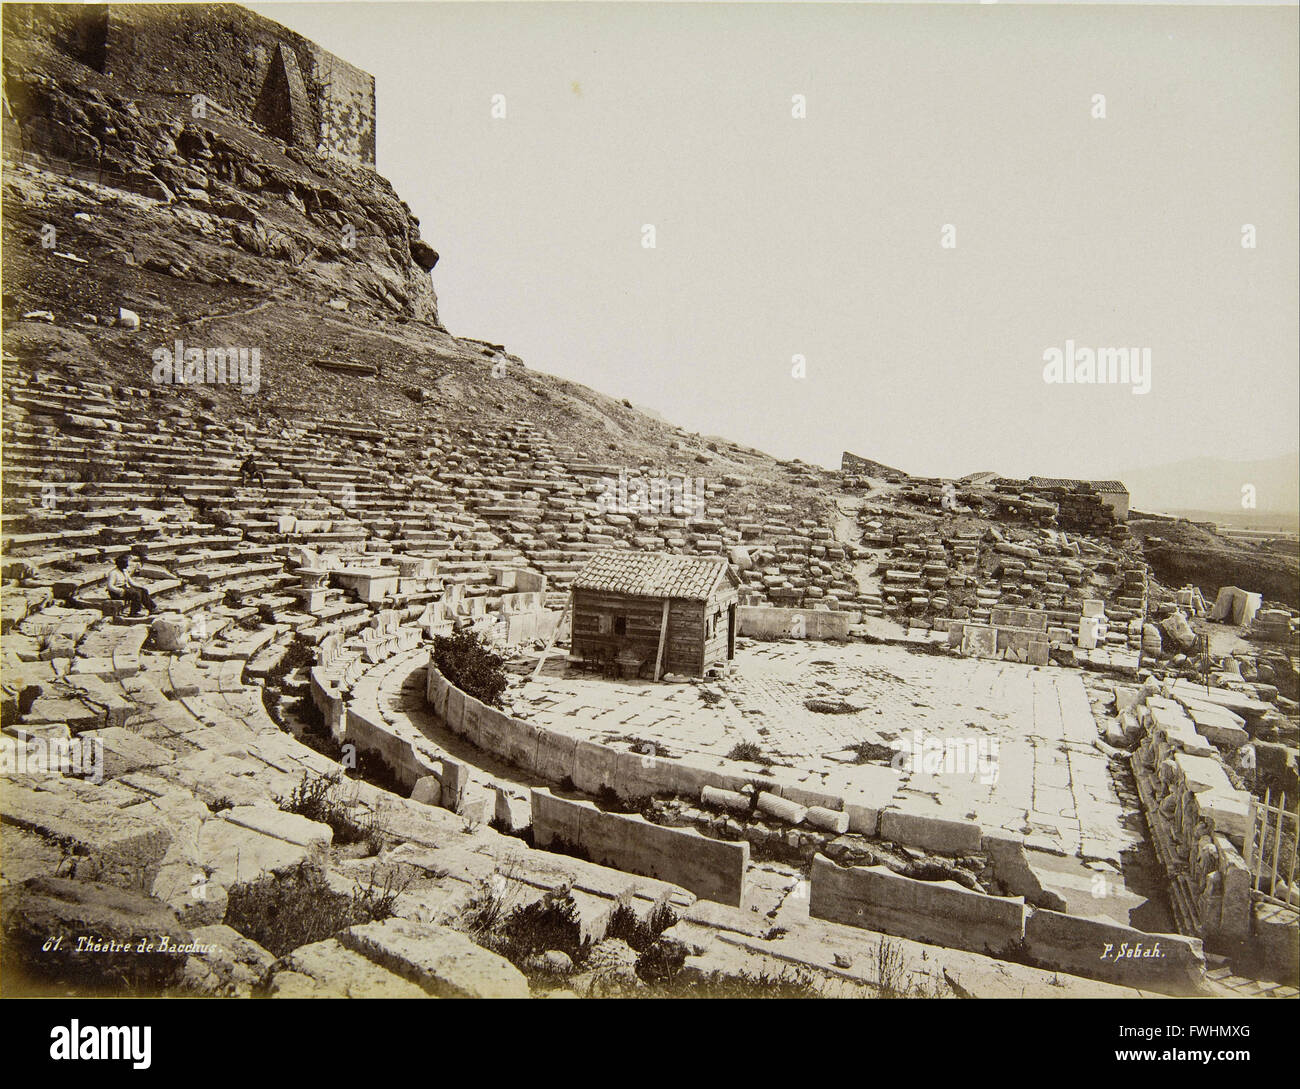 Sebah Pascal - das antike Theater des Dionysos - Benaki Museum der griechischen Zivilisation Stockbild